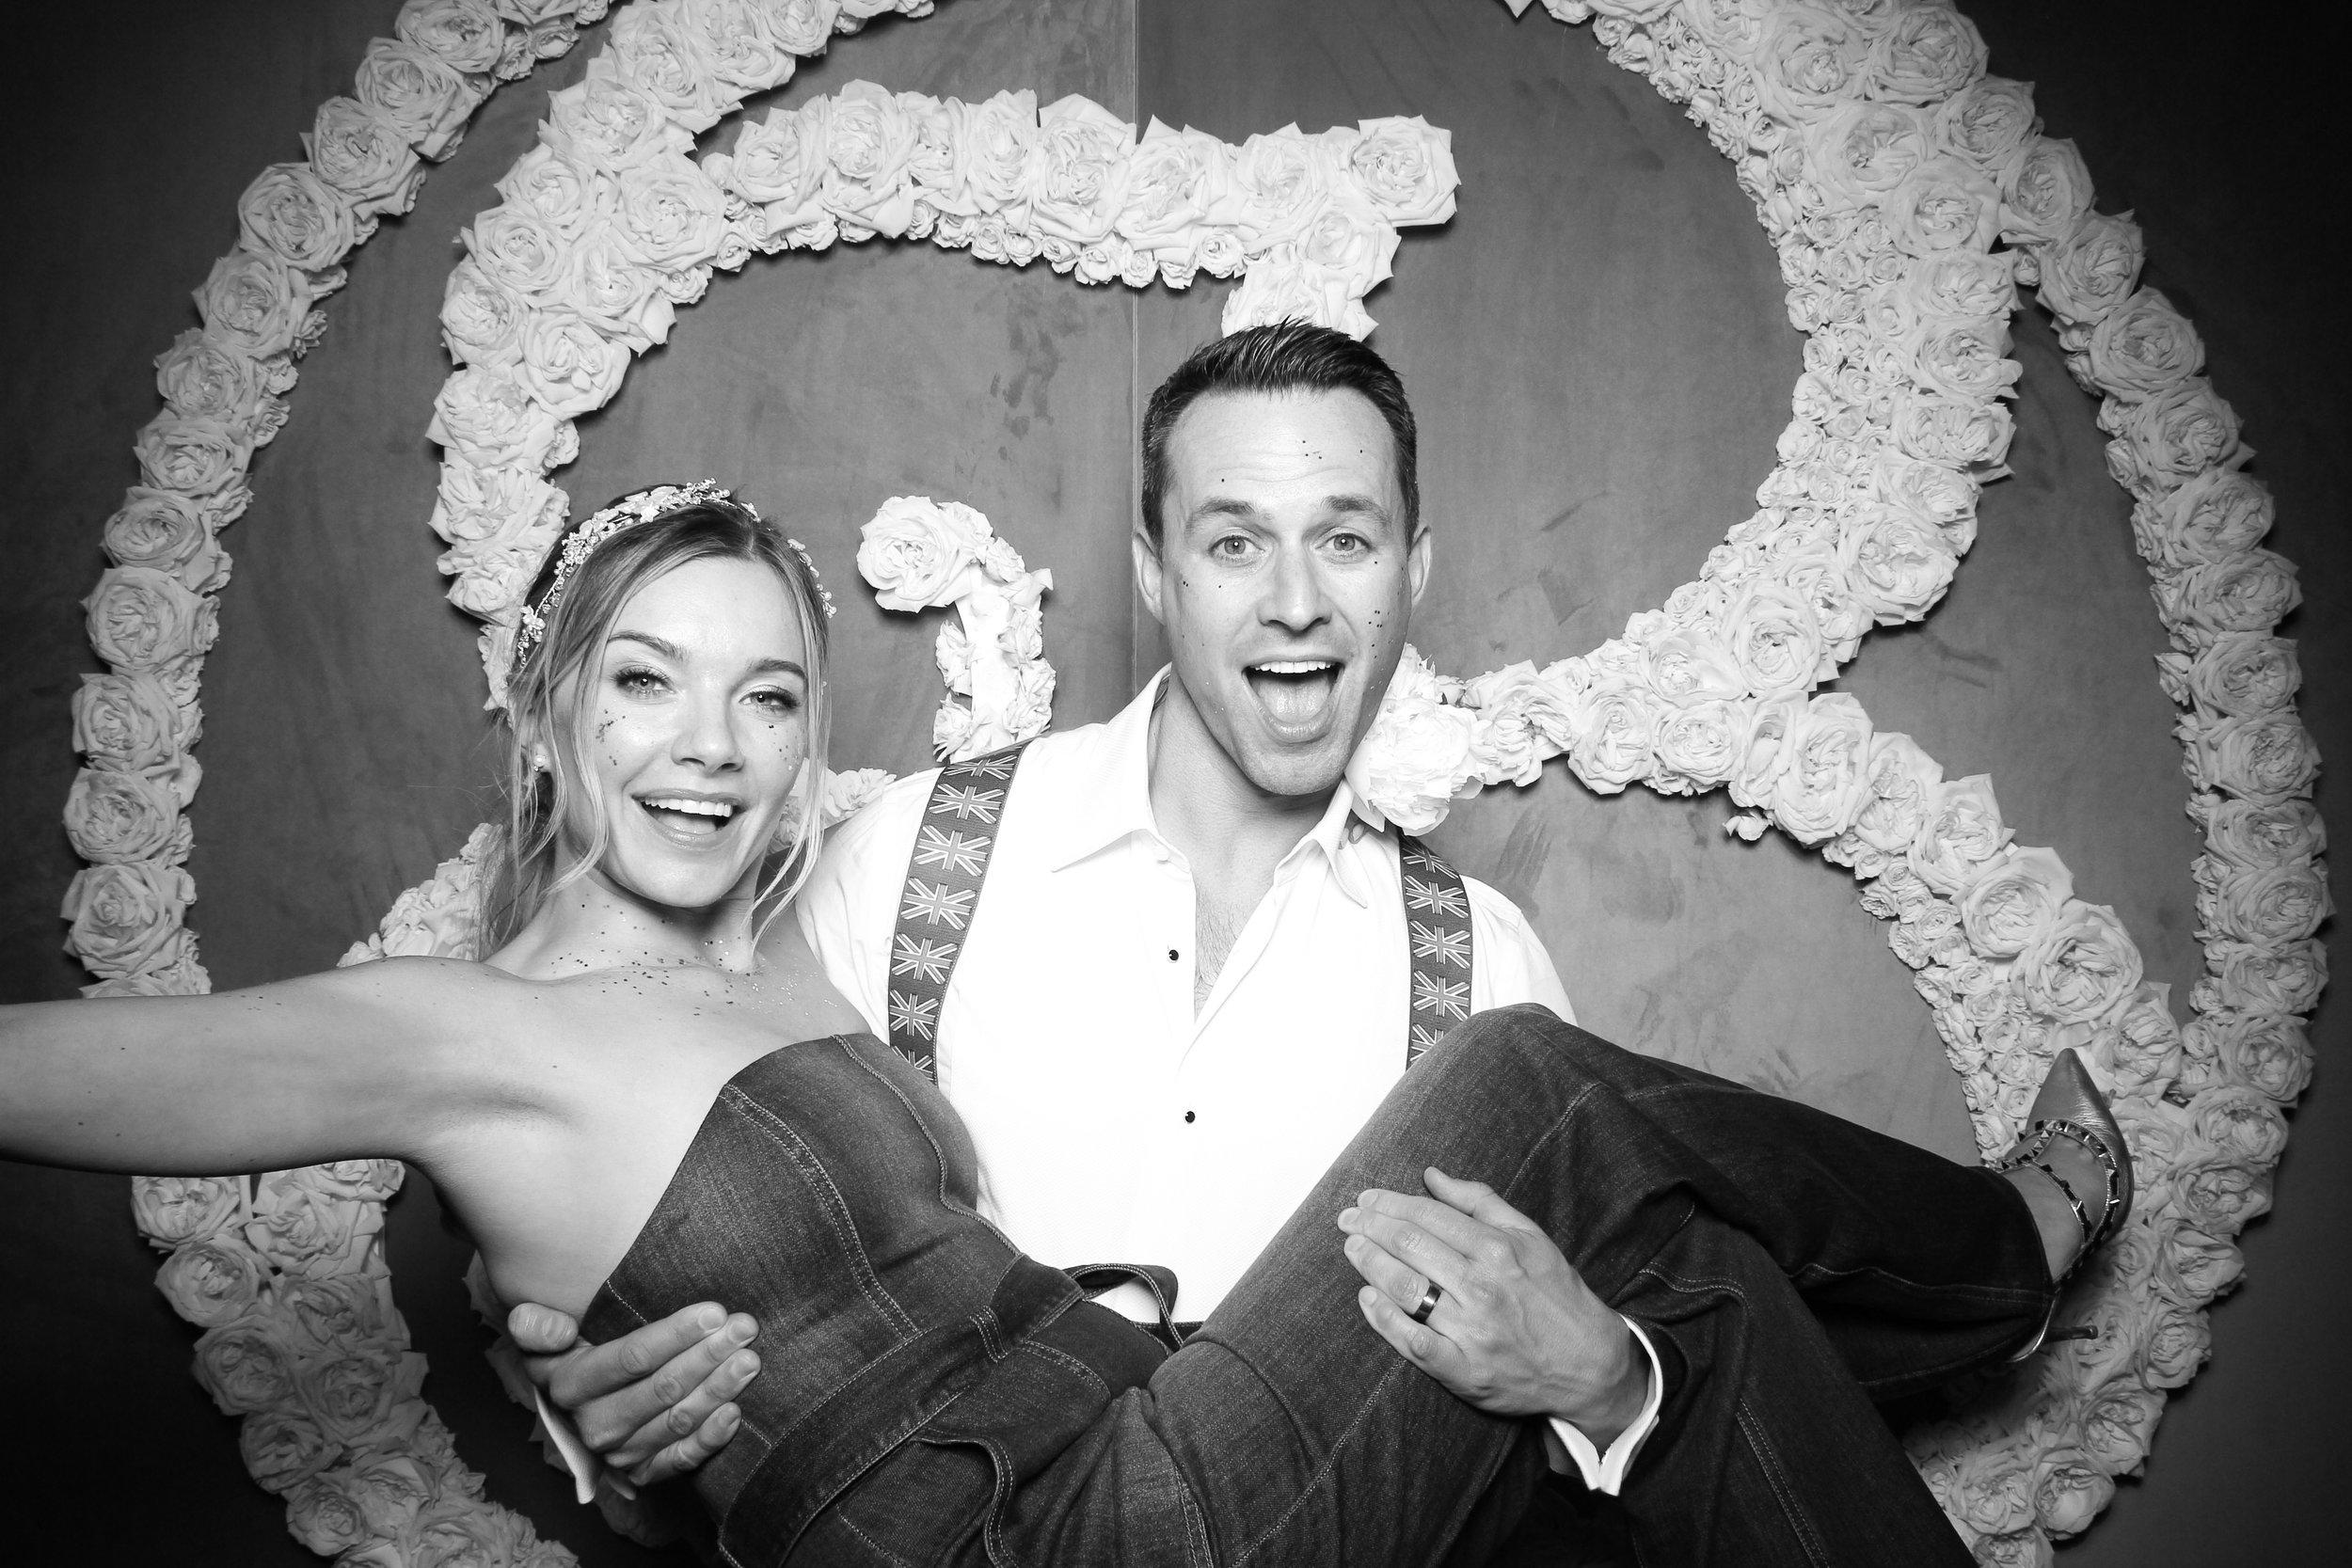 Photo_Booth_Rental_At_Standard_Club_Wedding_Chicago_13.jpg